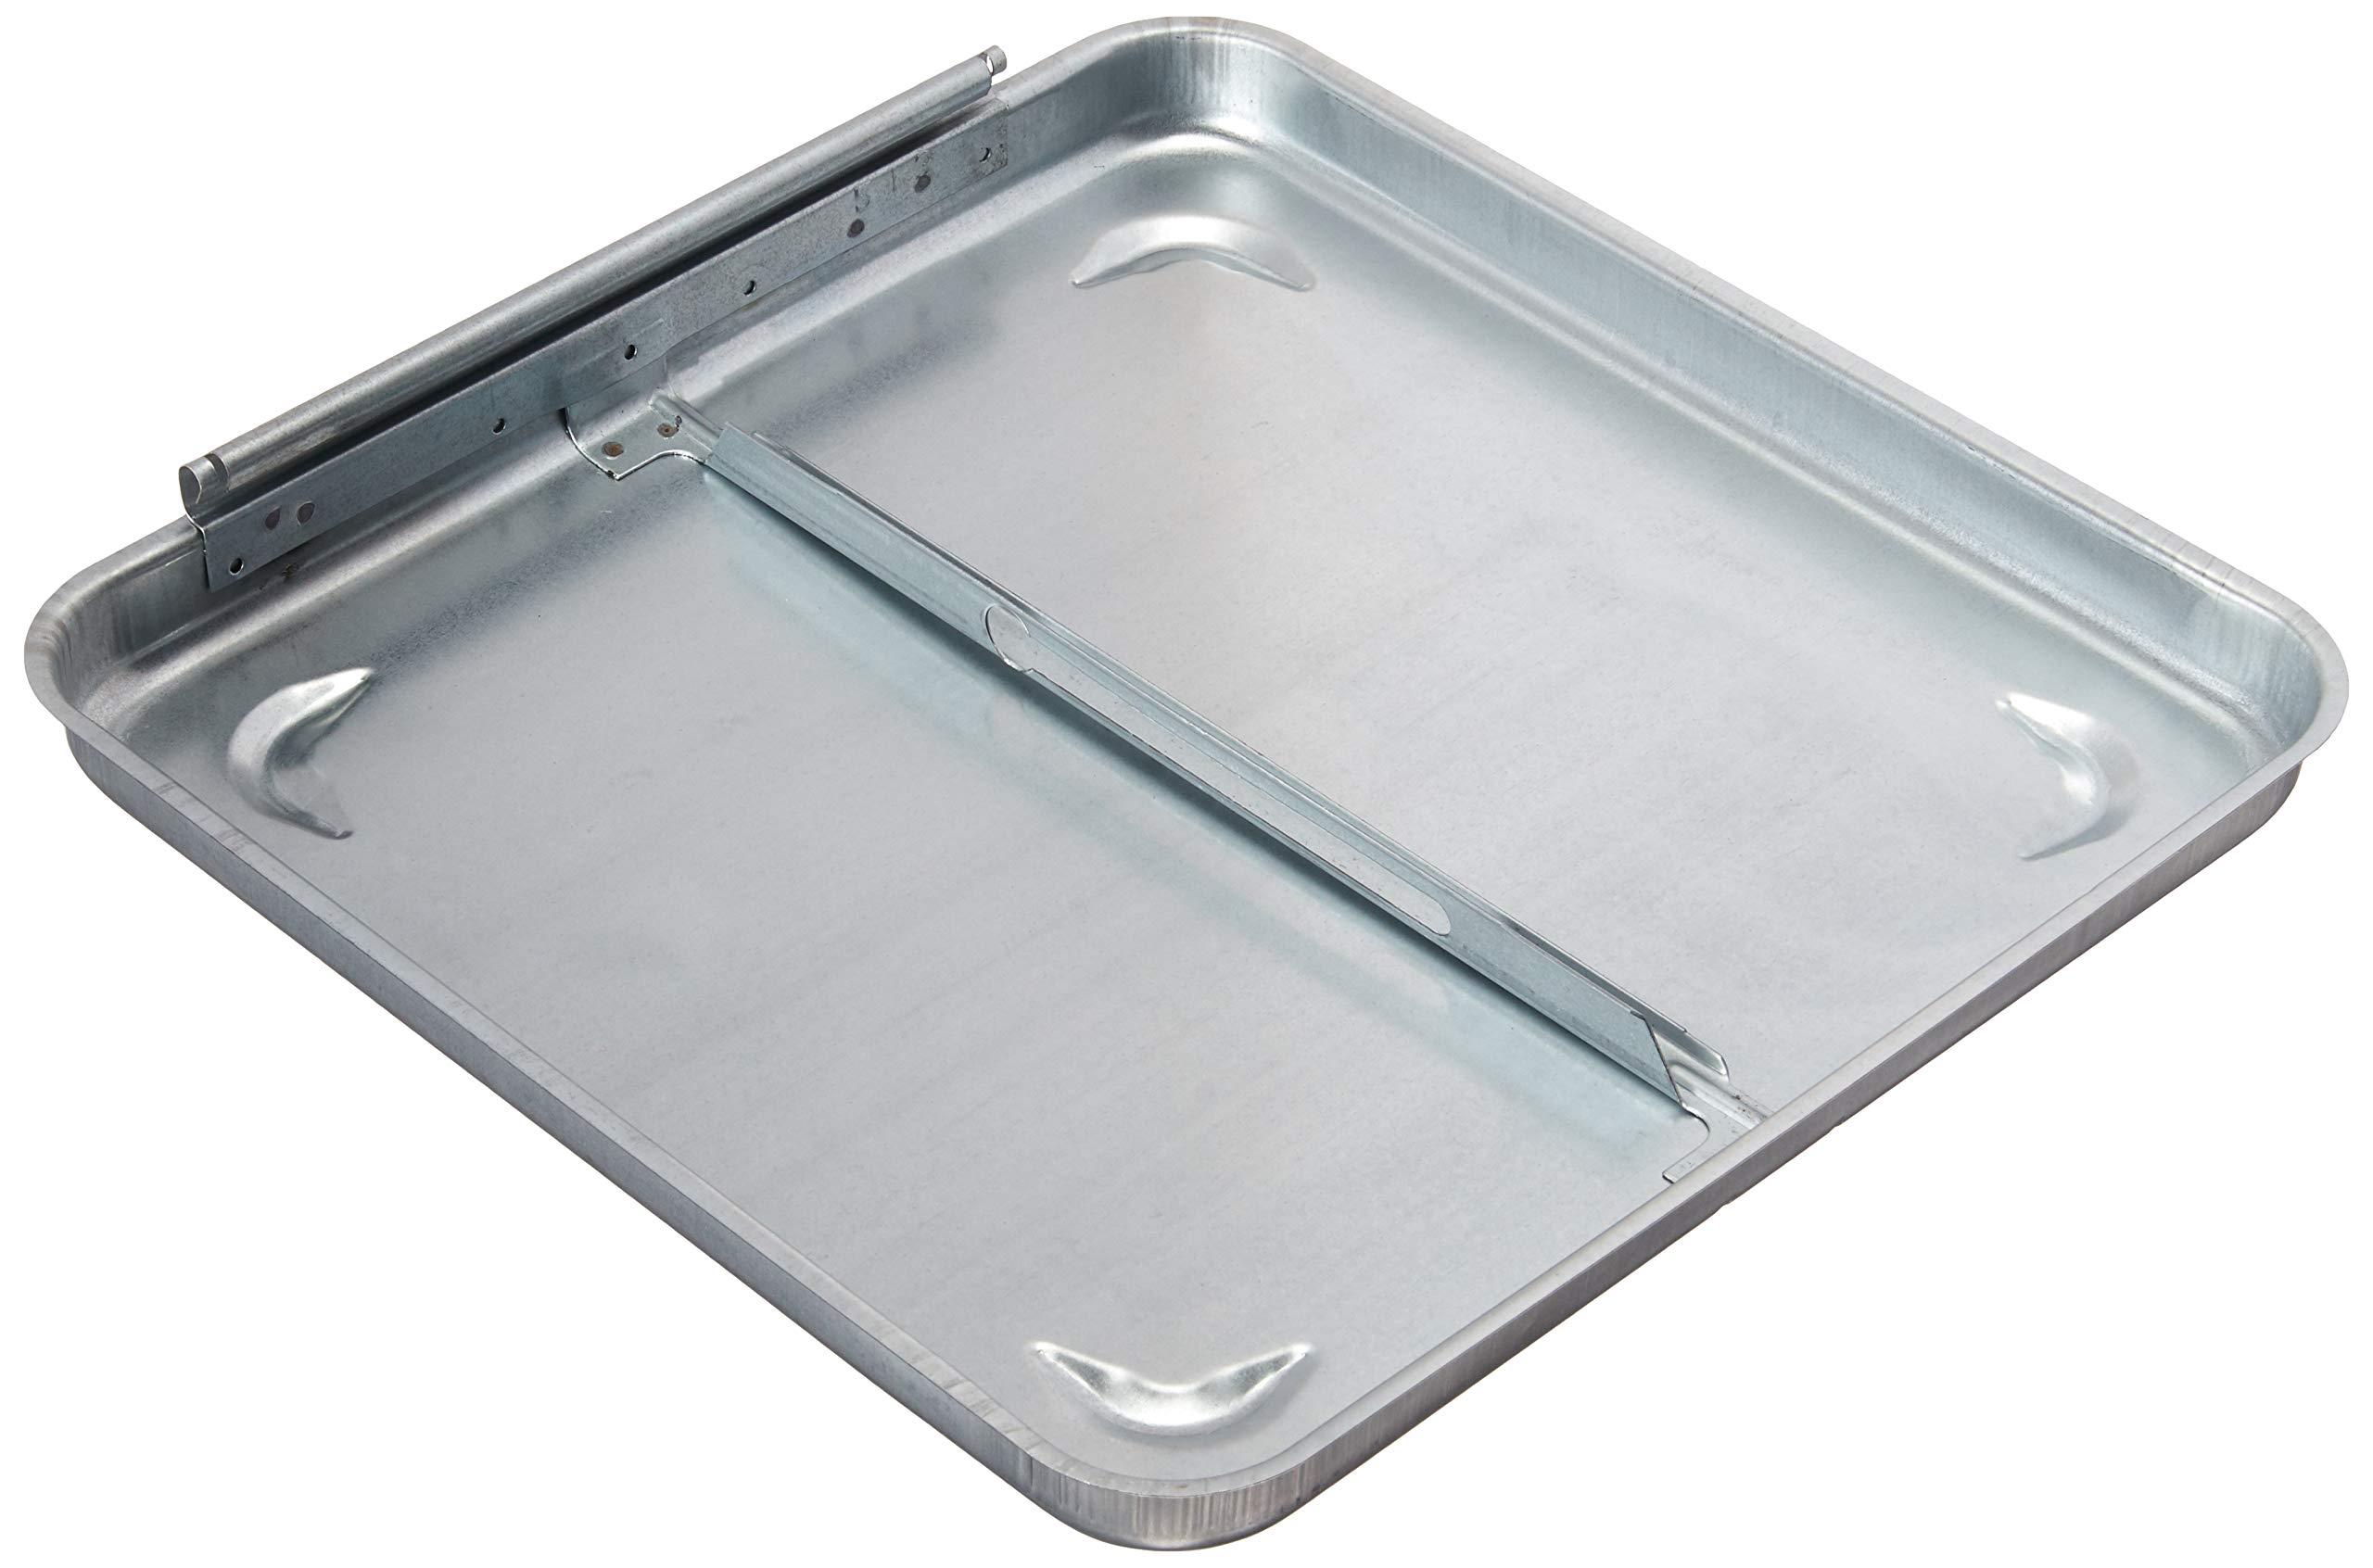 Ventline BV053400 14'' Aluminum Vent Lid by Ventline